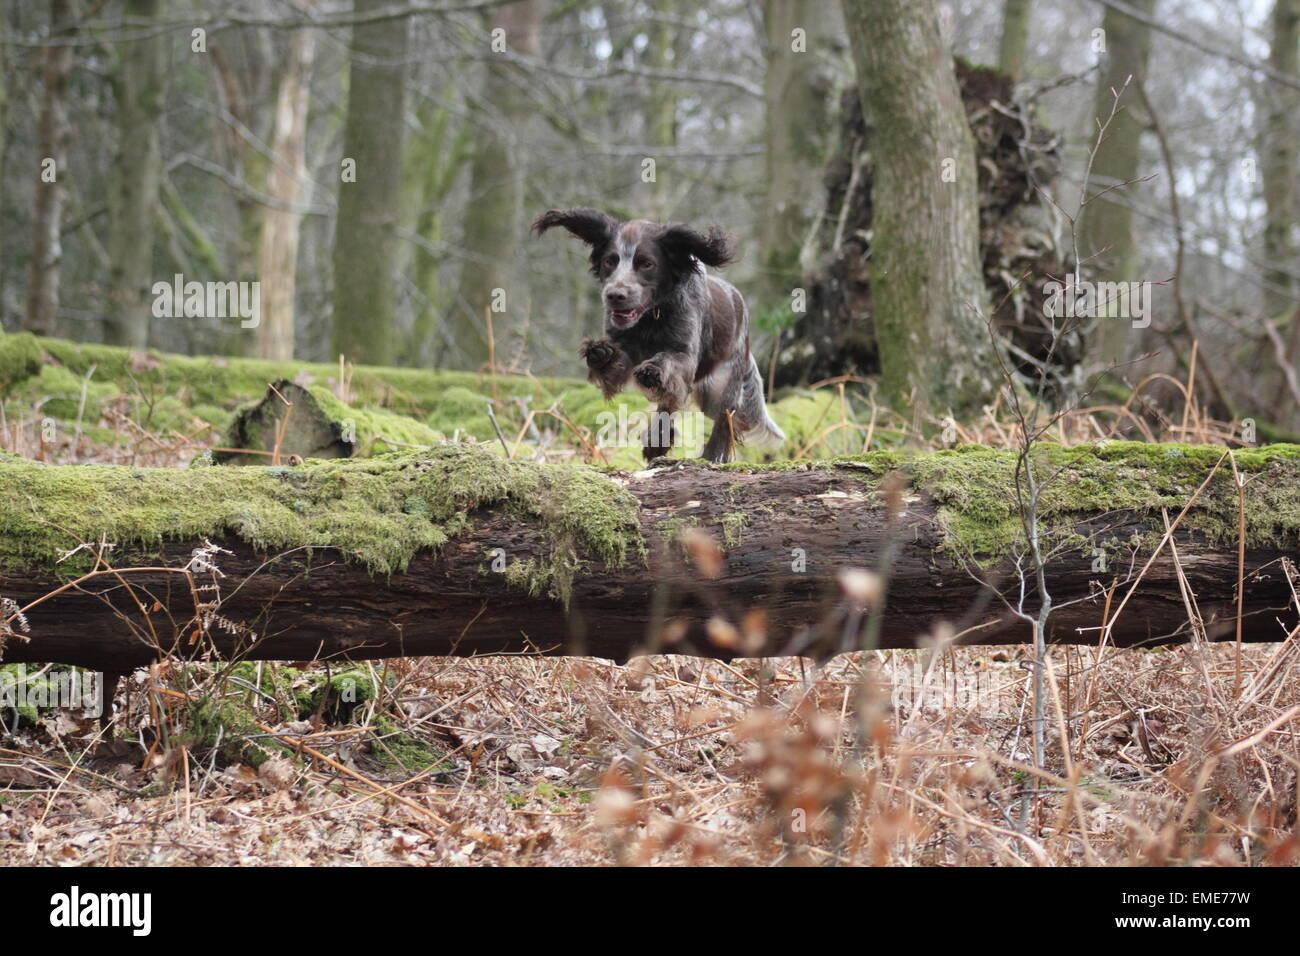 Cocker spaniel jumping over a fallen tree - Stock Image